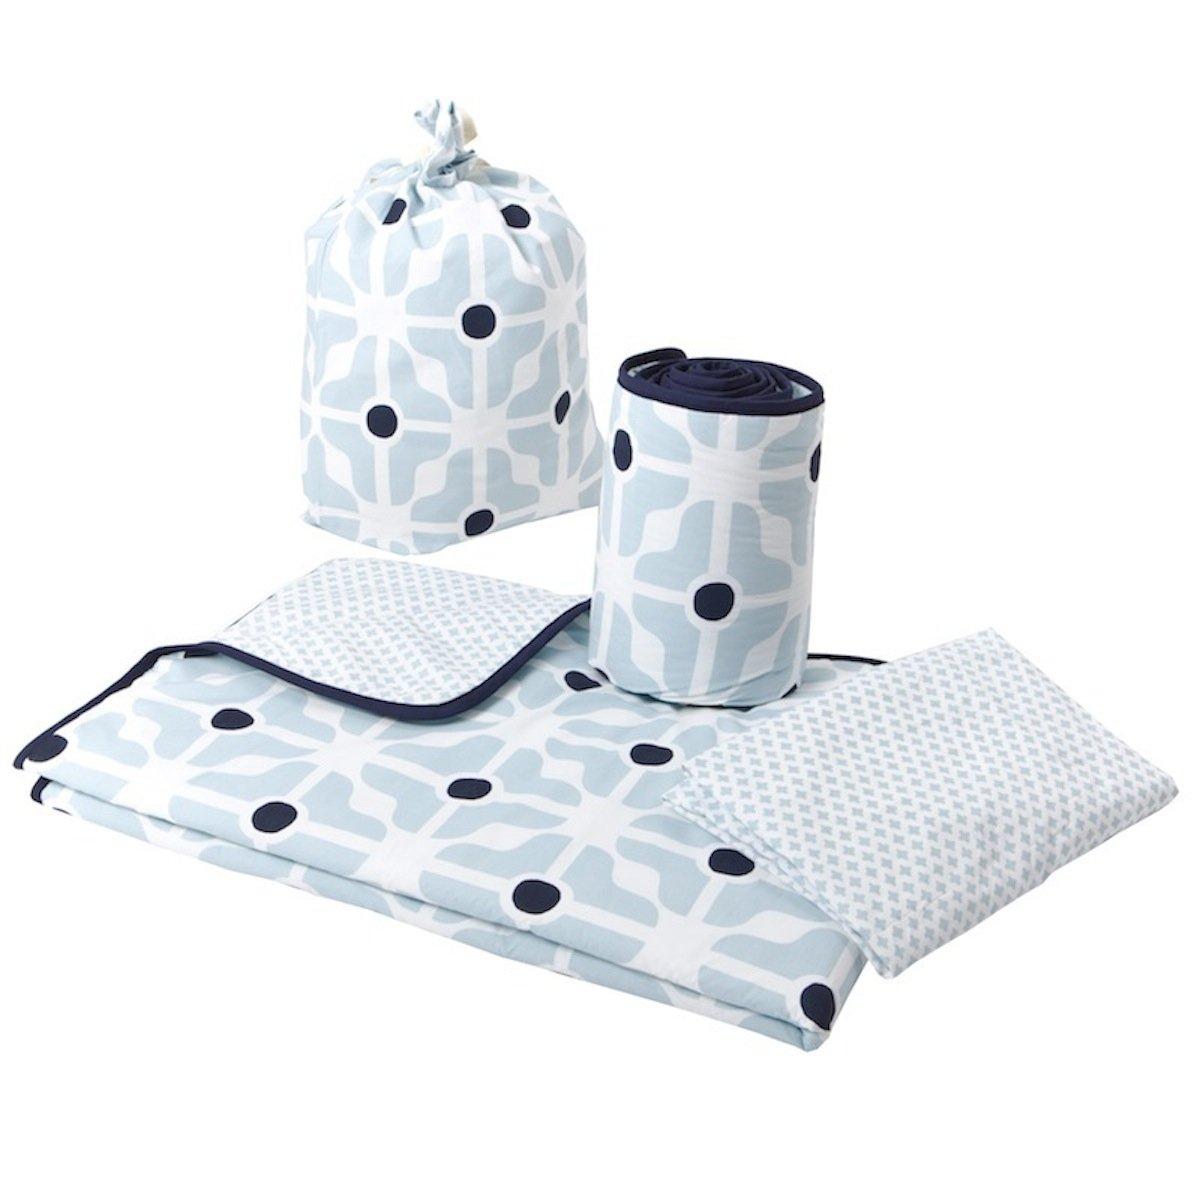 Olli Ella Cot Bed Linen Set with Half Bumper (Blue) by BabyCentre